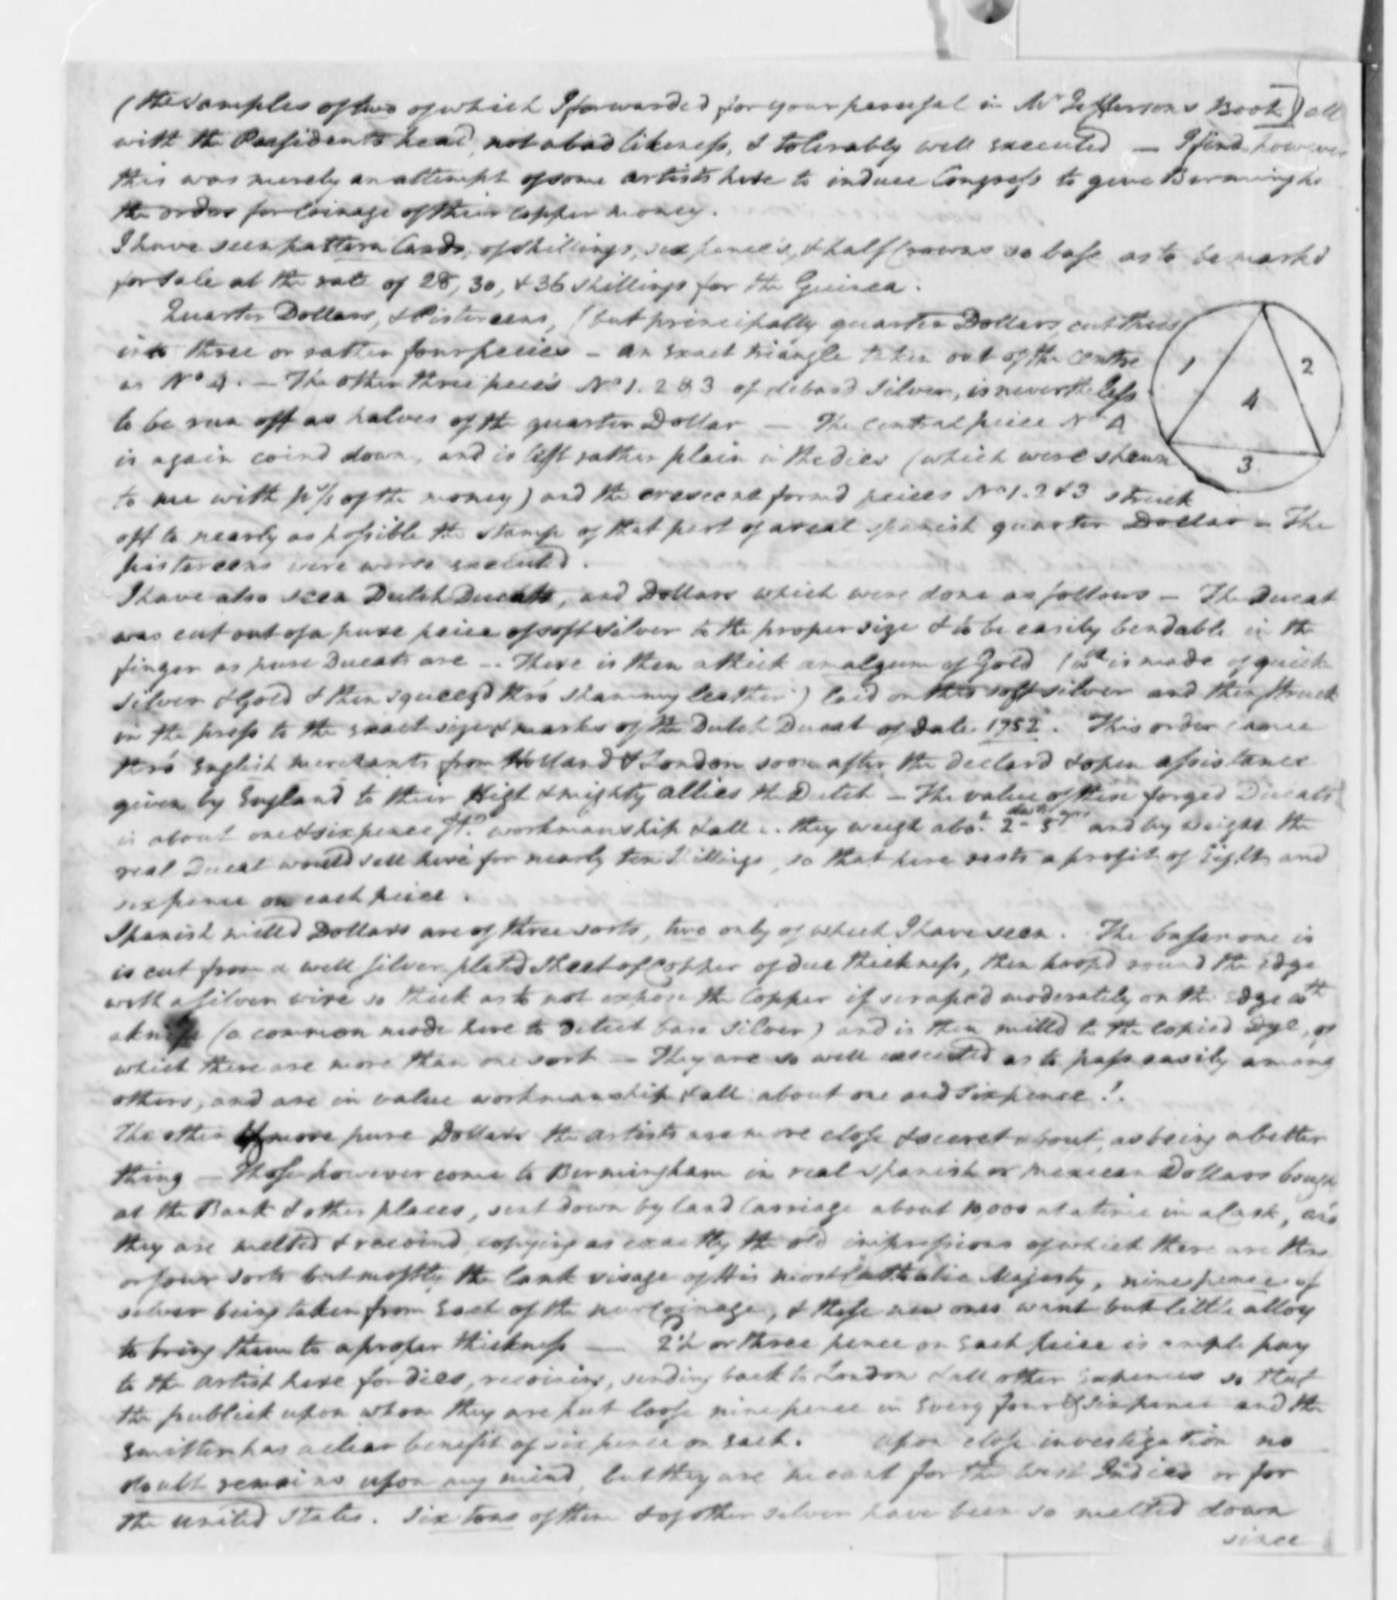 Thomas A. Digges to Thomas Pinckney, April 6, 1793